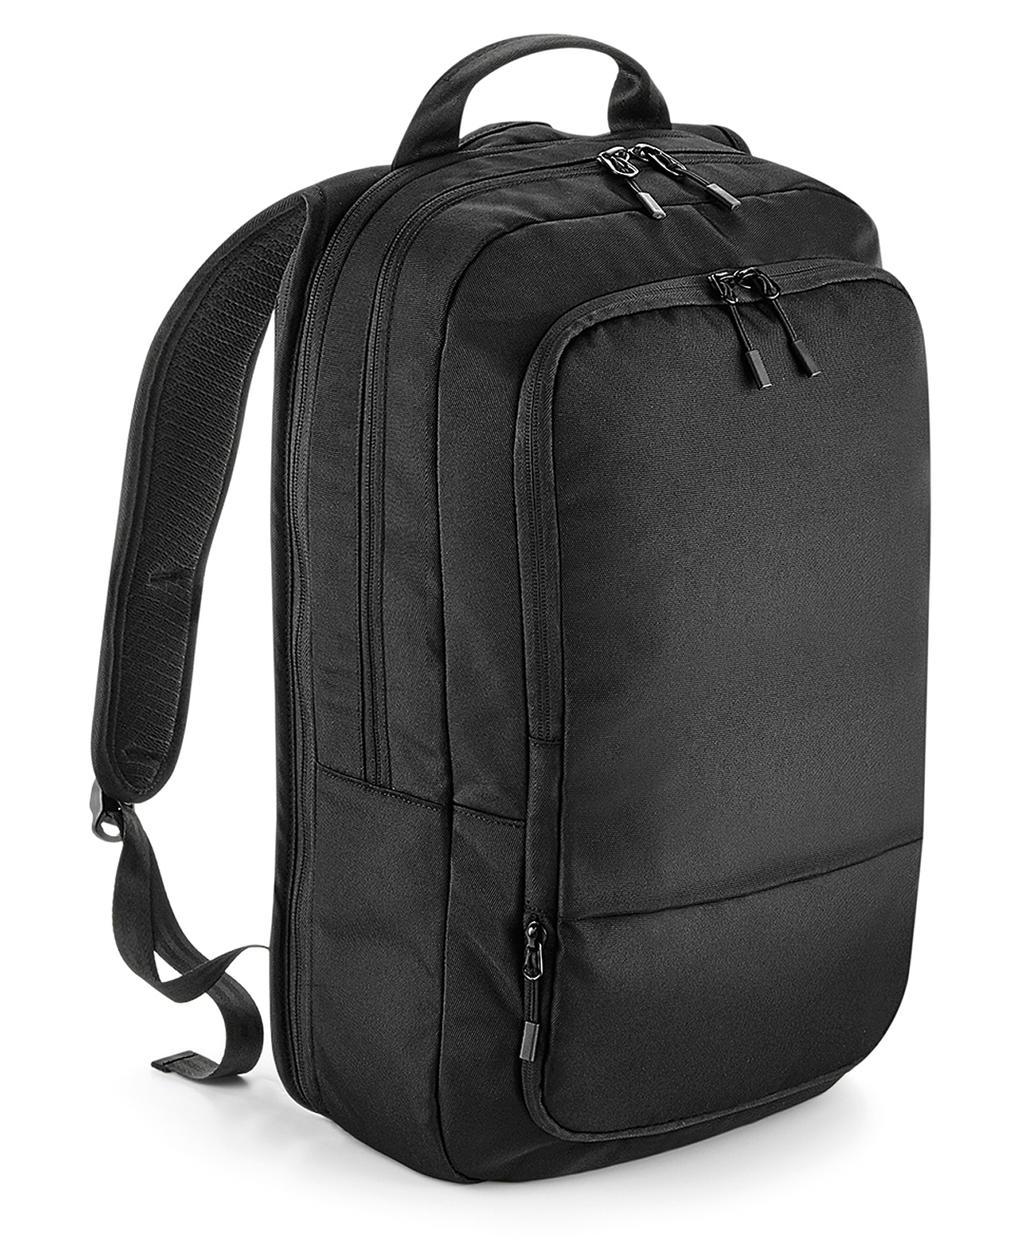 Pitch Black 24 Hour Backpack - zvìtšit obrázek